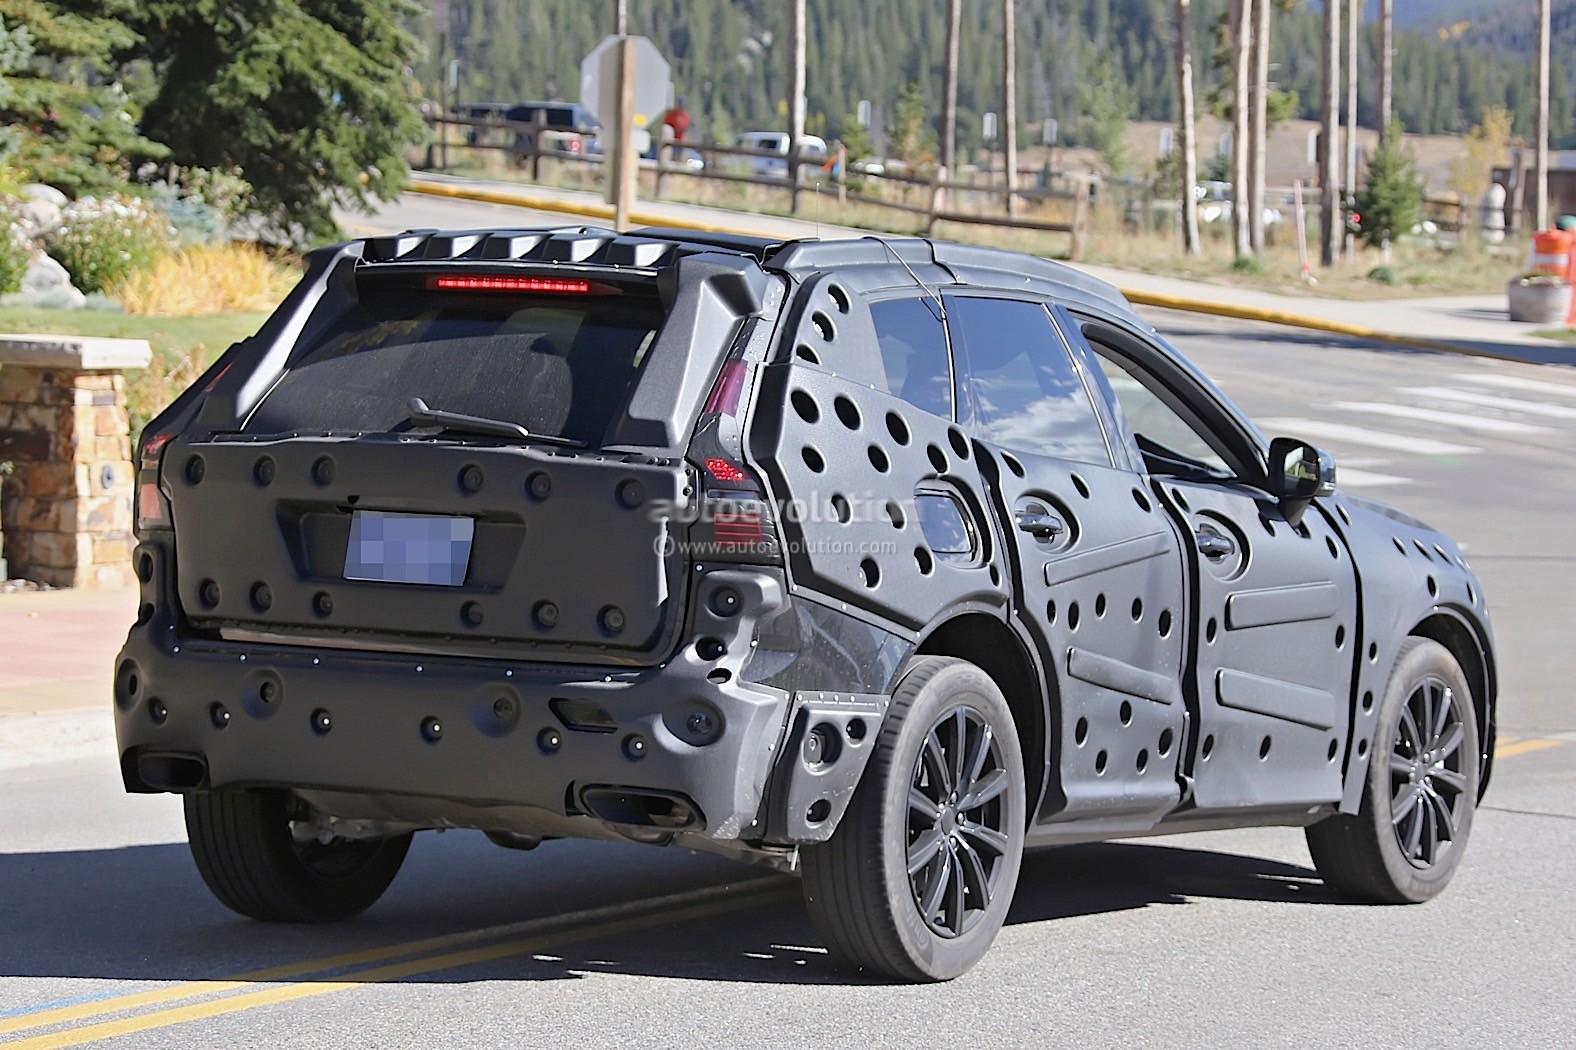 2018 Volvo Xc60 Prototype Shows Some Of Its Interior